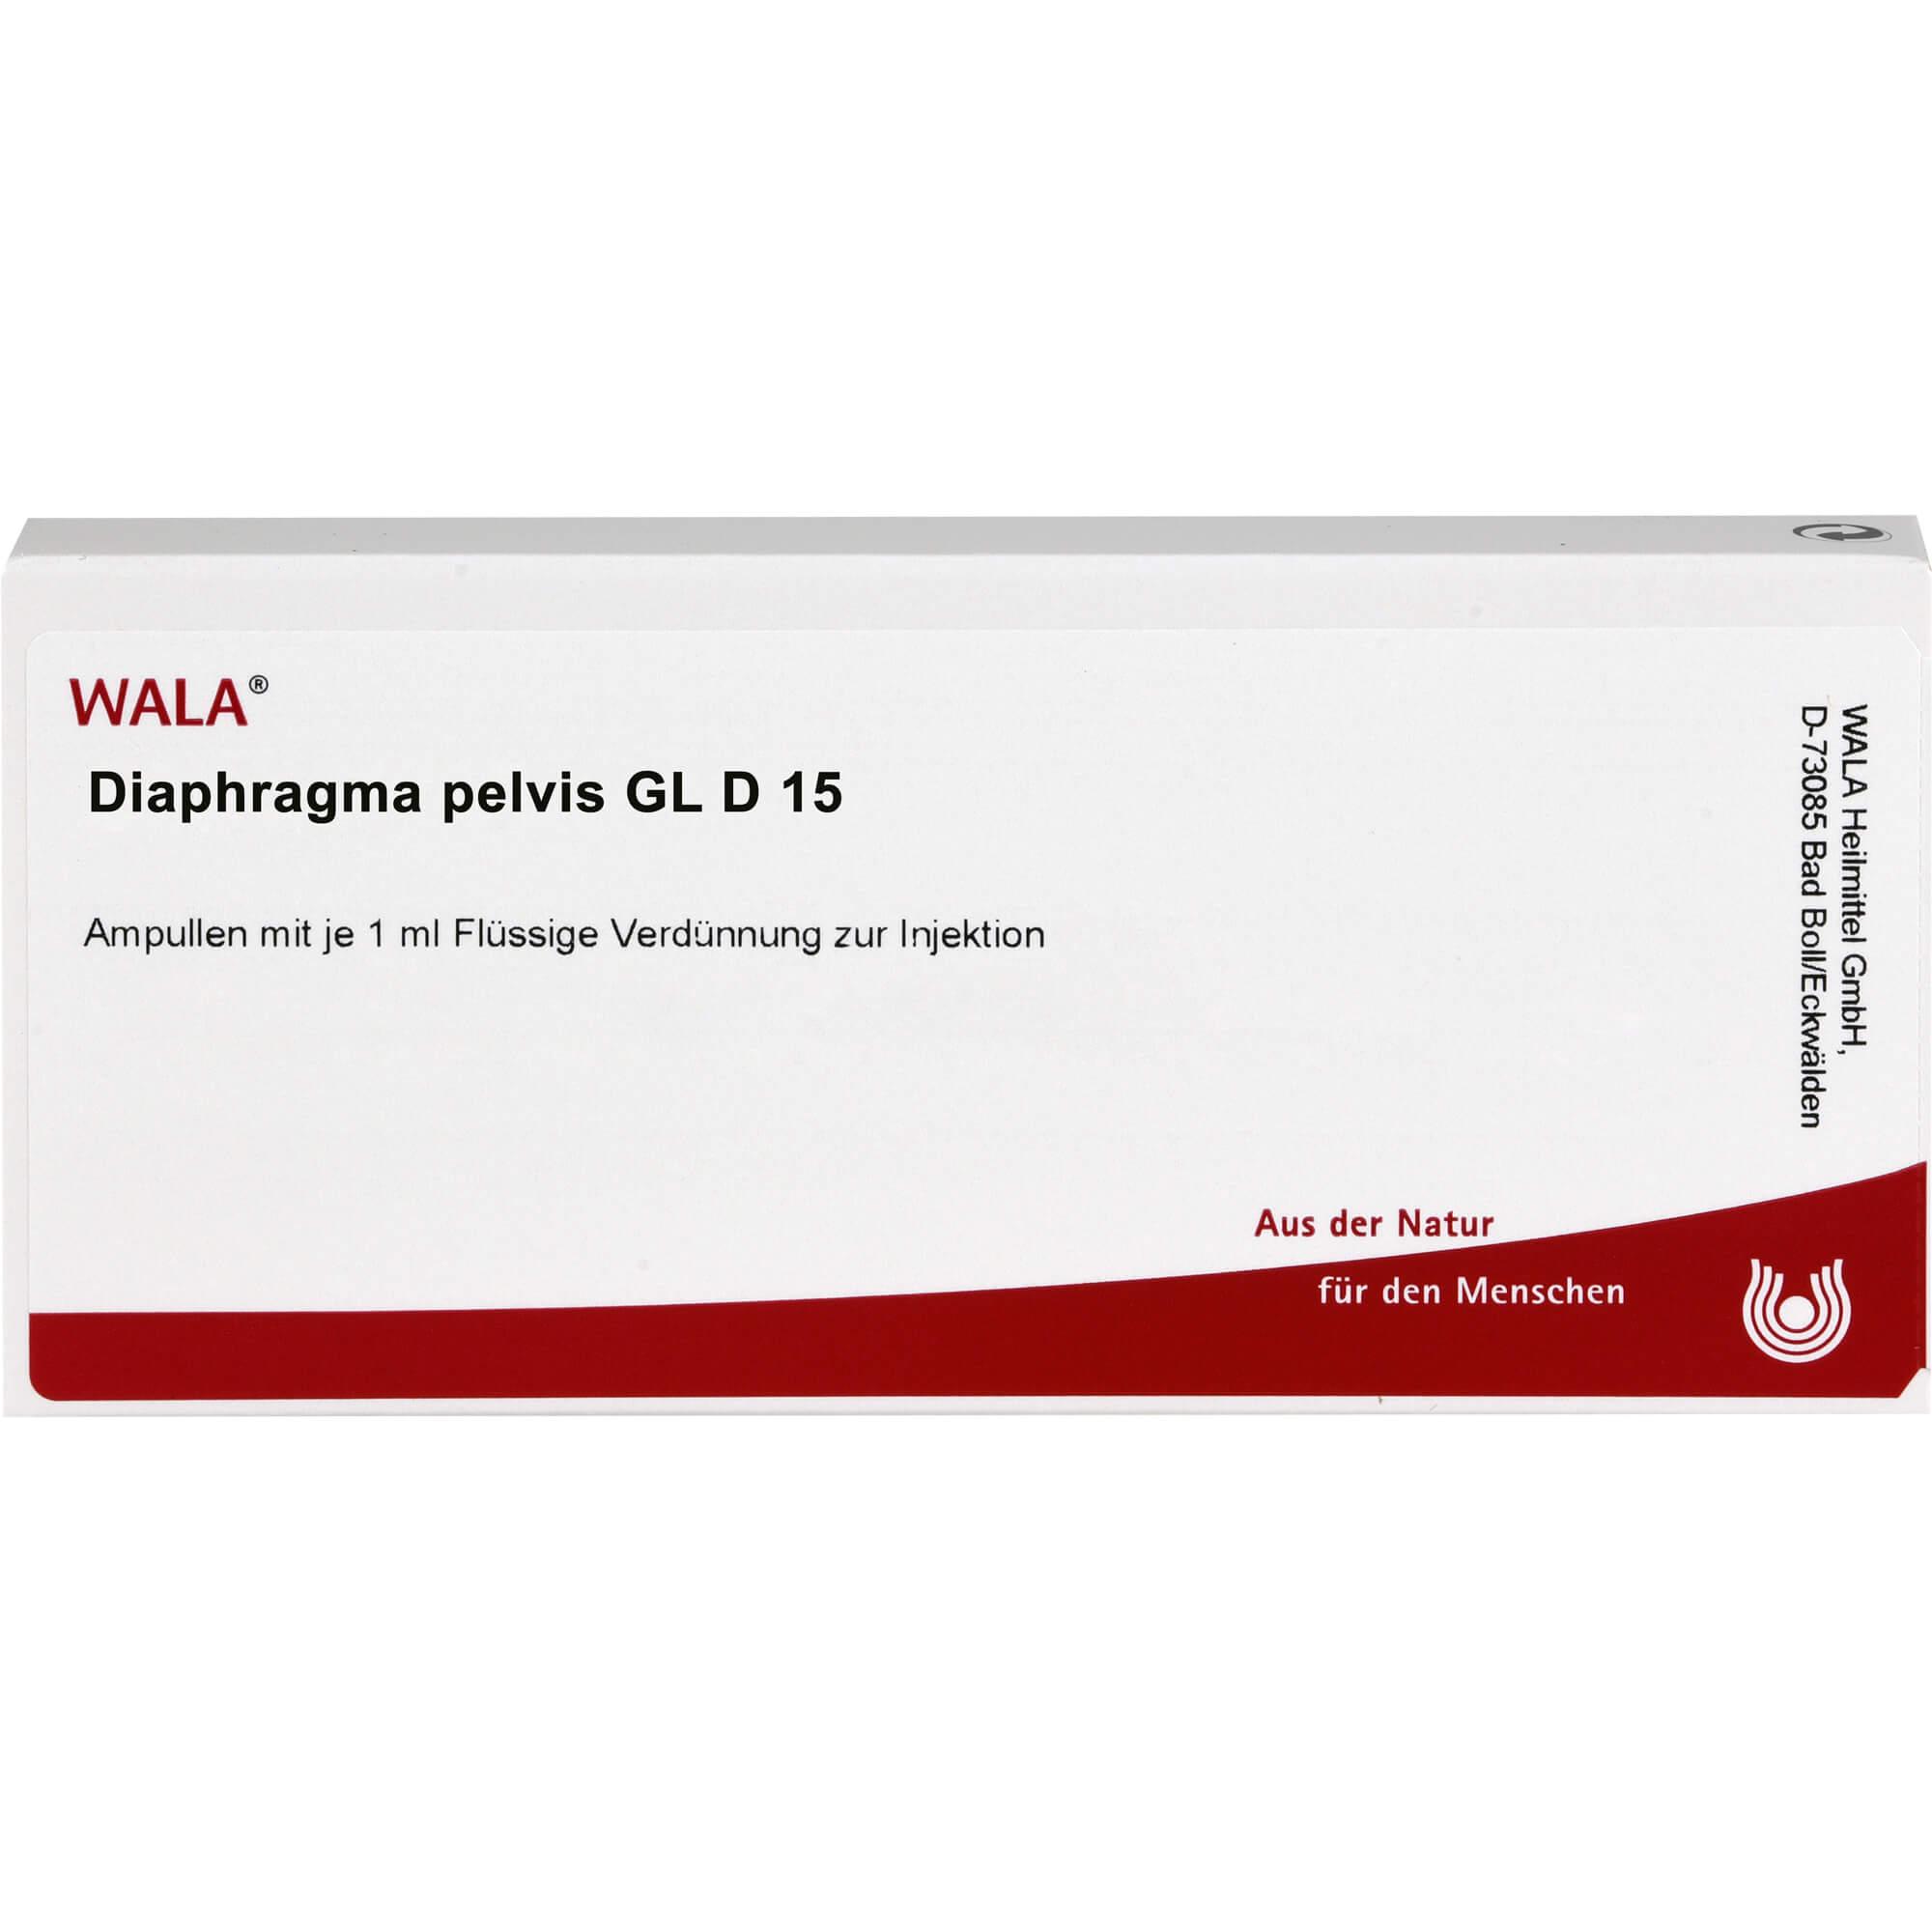 DIAPHRAGMA PELVIS GL D 15 Ampullen